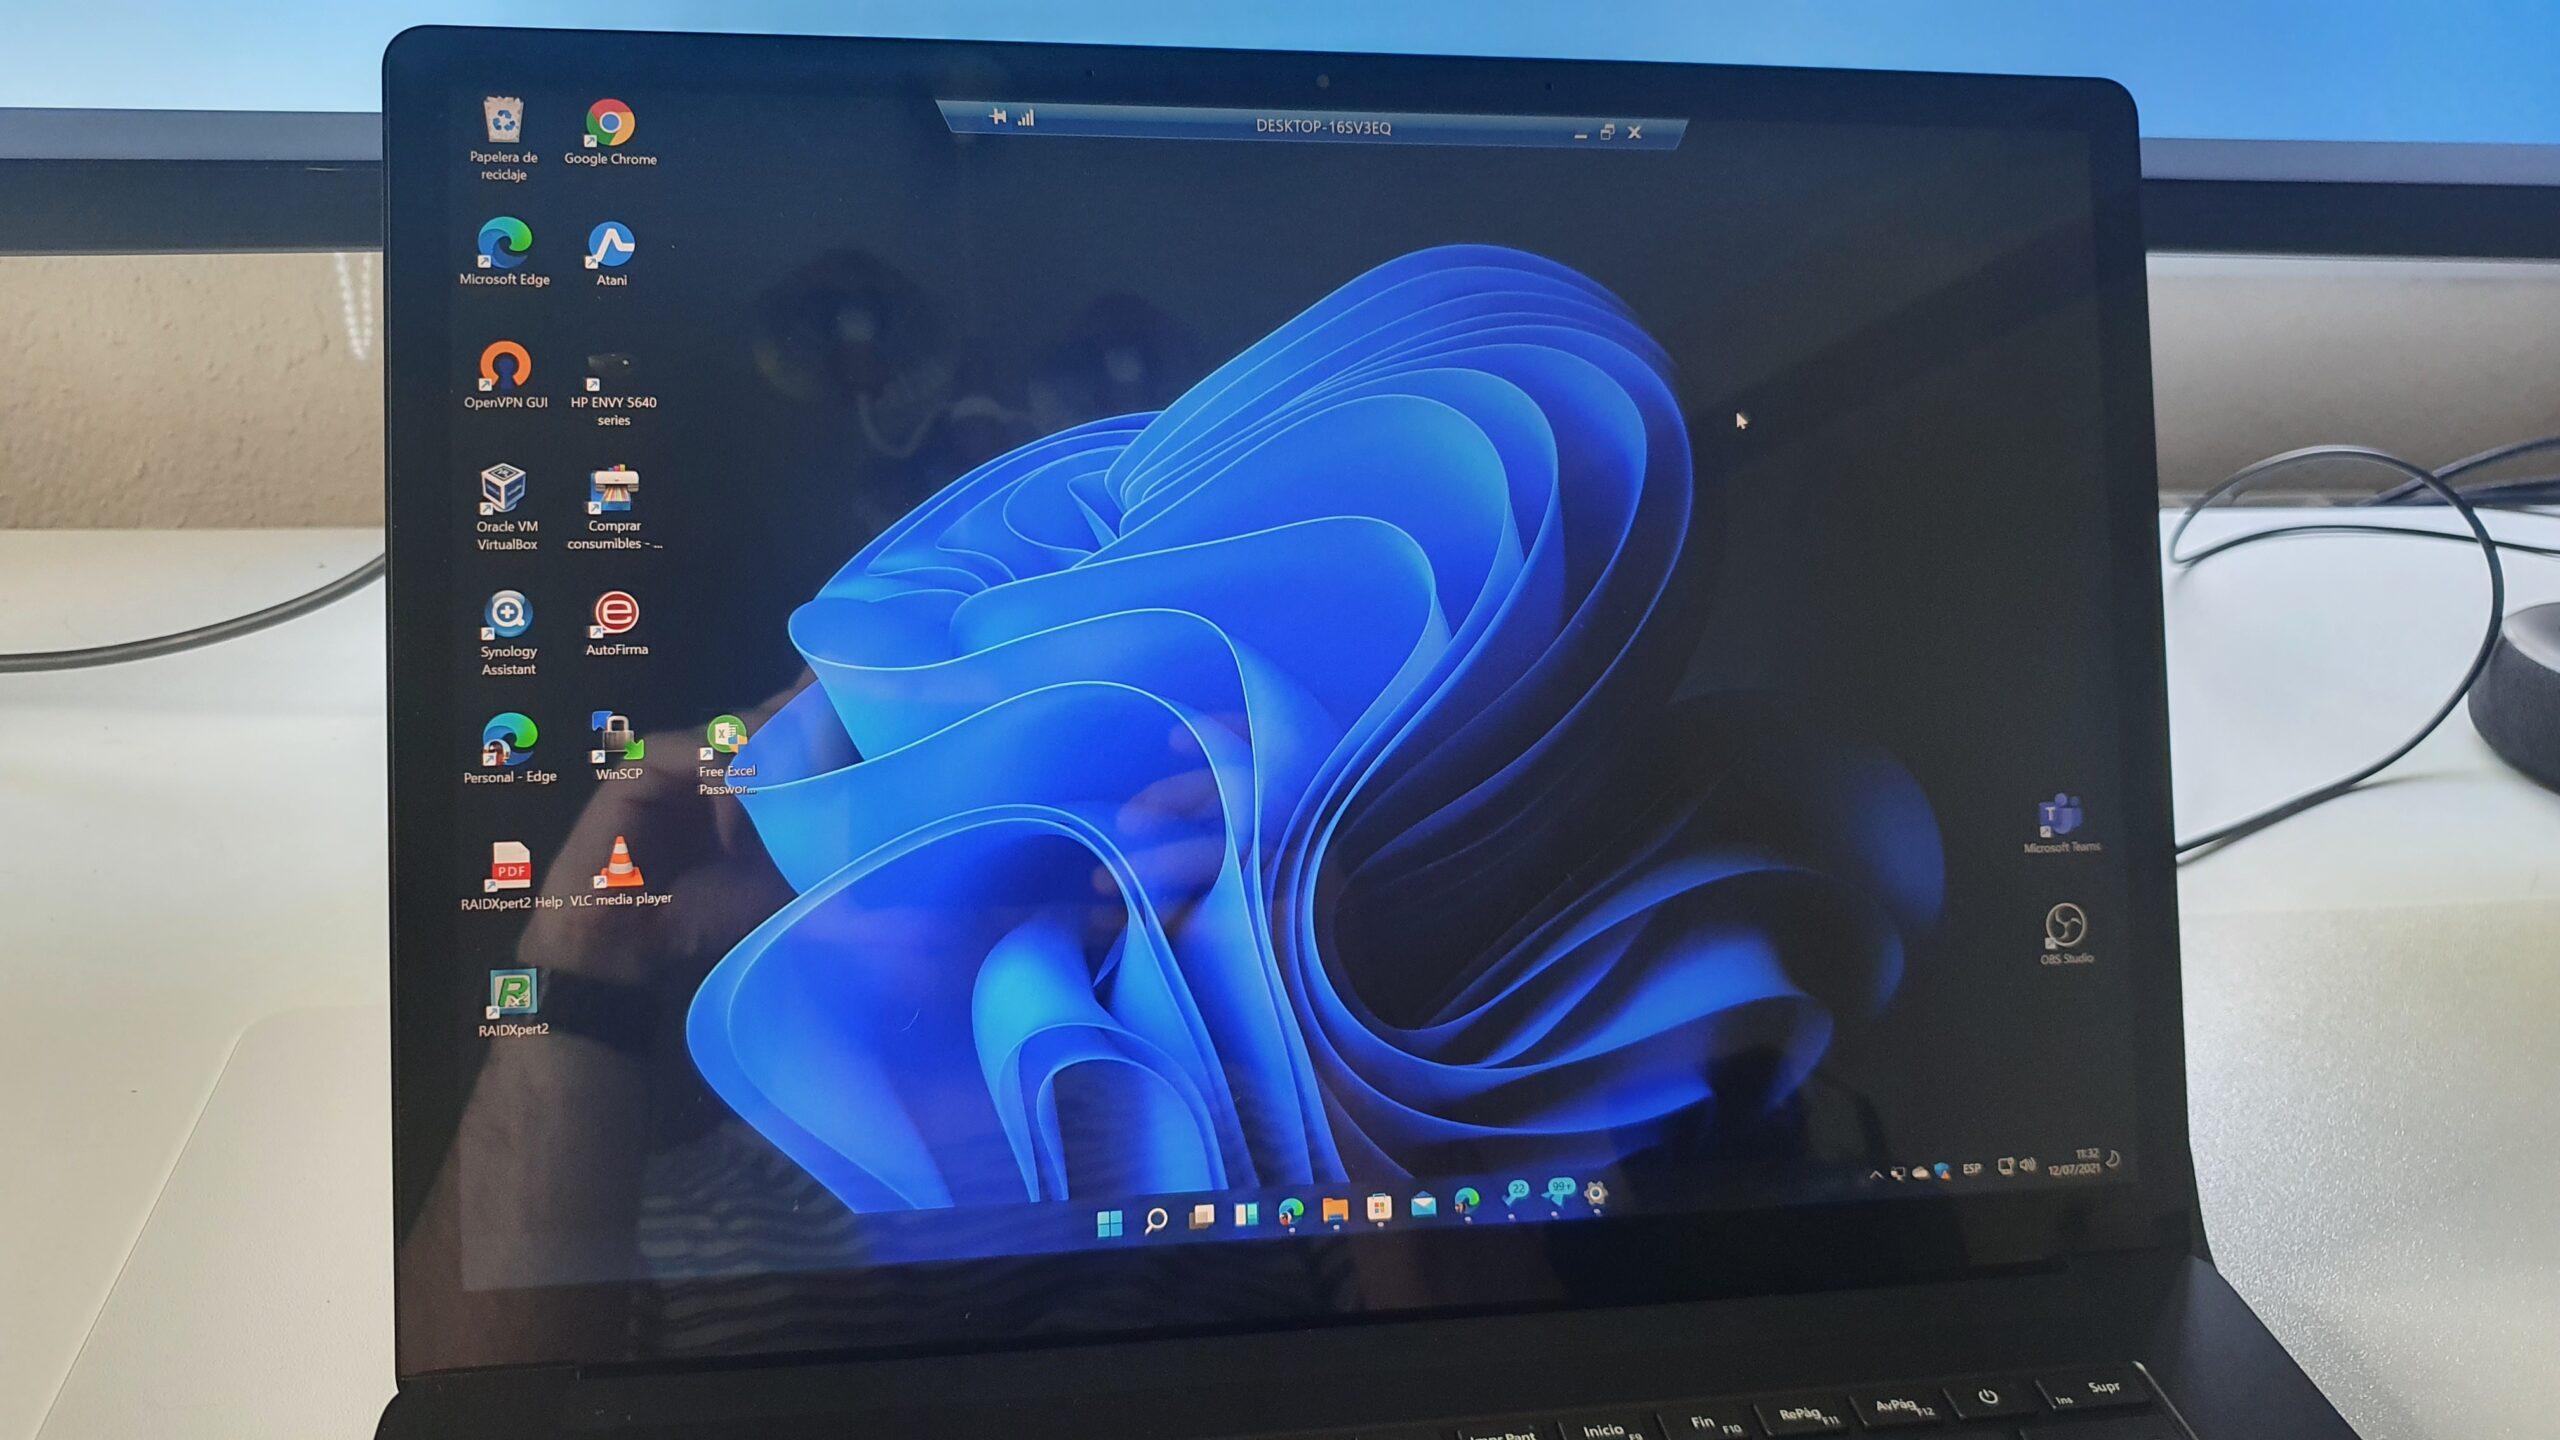 Escritorio remoto con Windows 11 en Surface Laptop 4